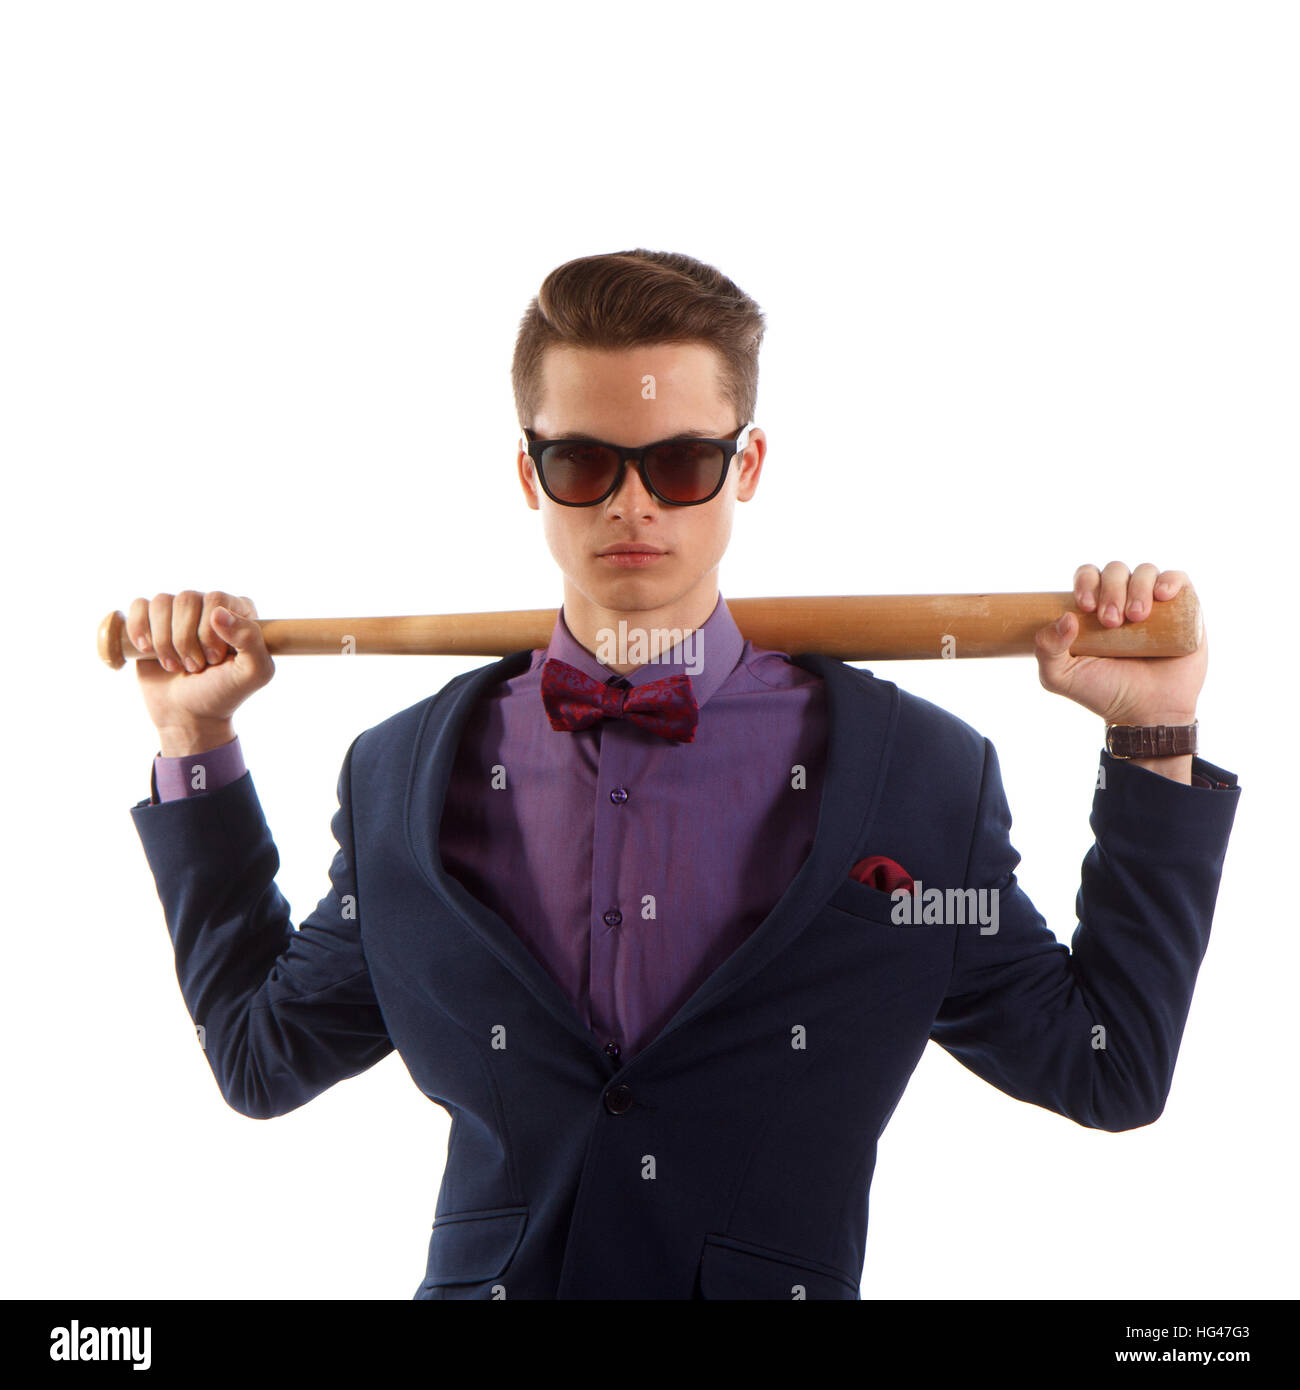 Formal teen with baseball bat - Stock Image